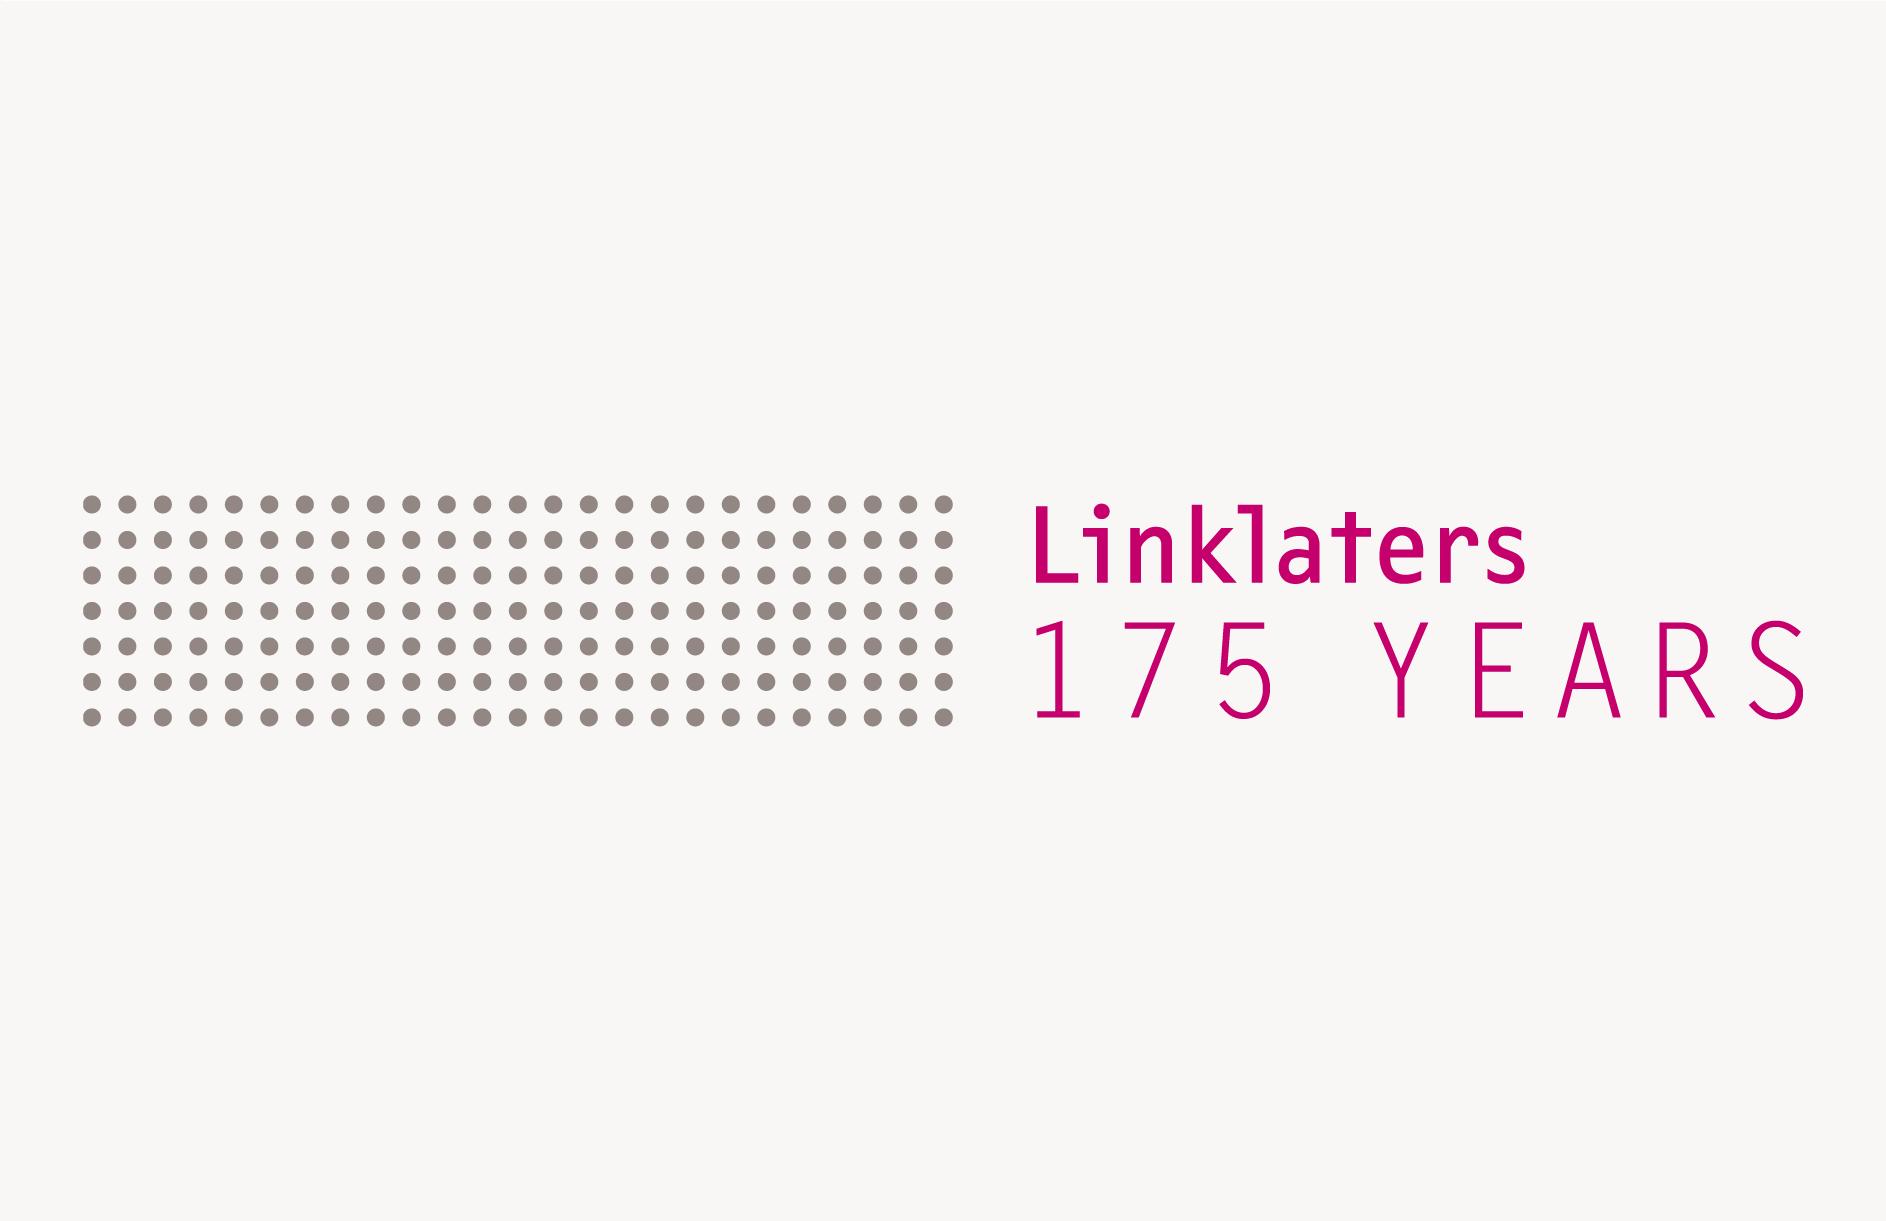 Linklaters / Linklaters 175